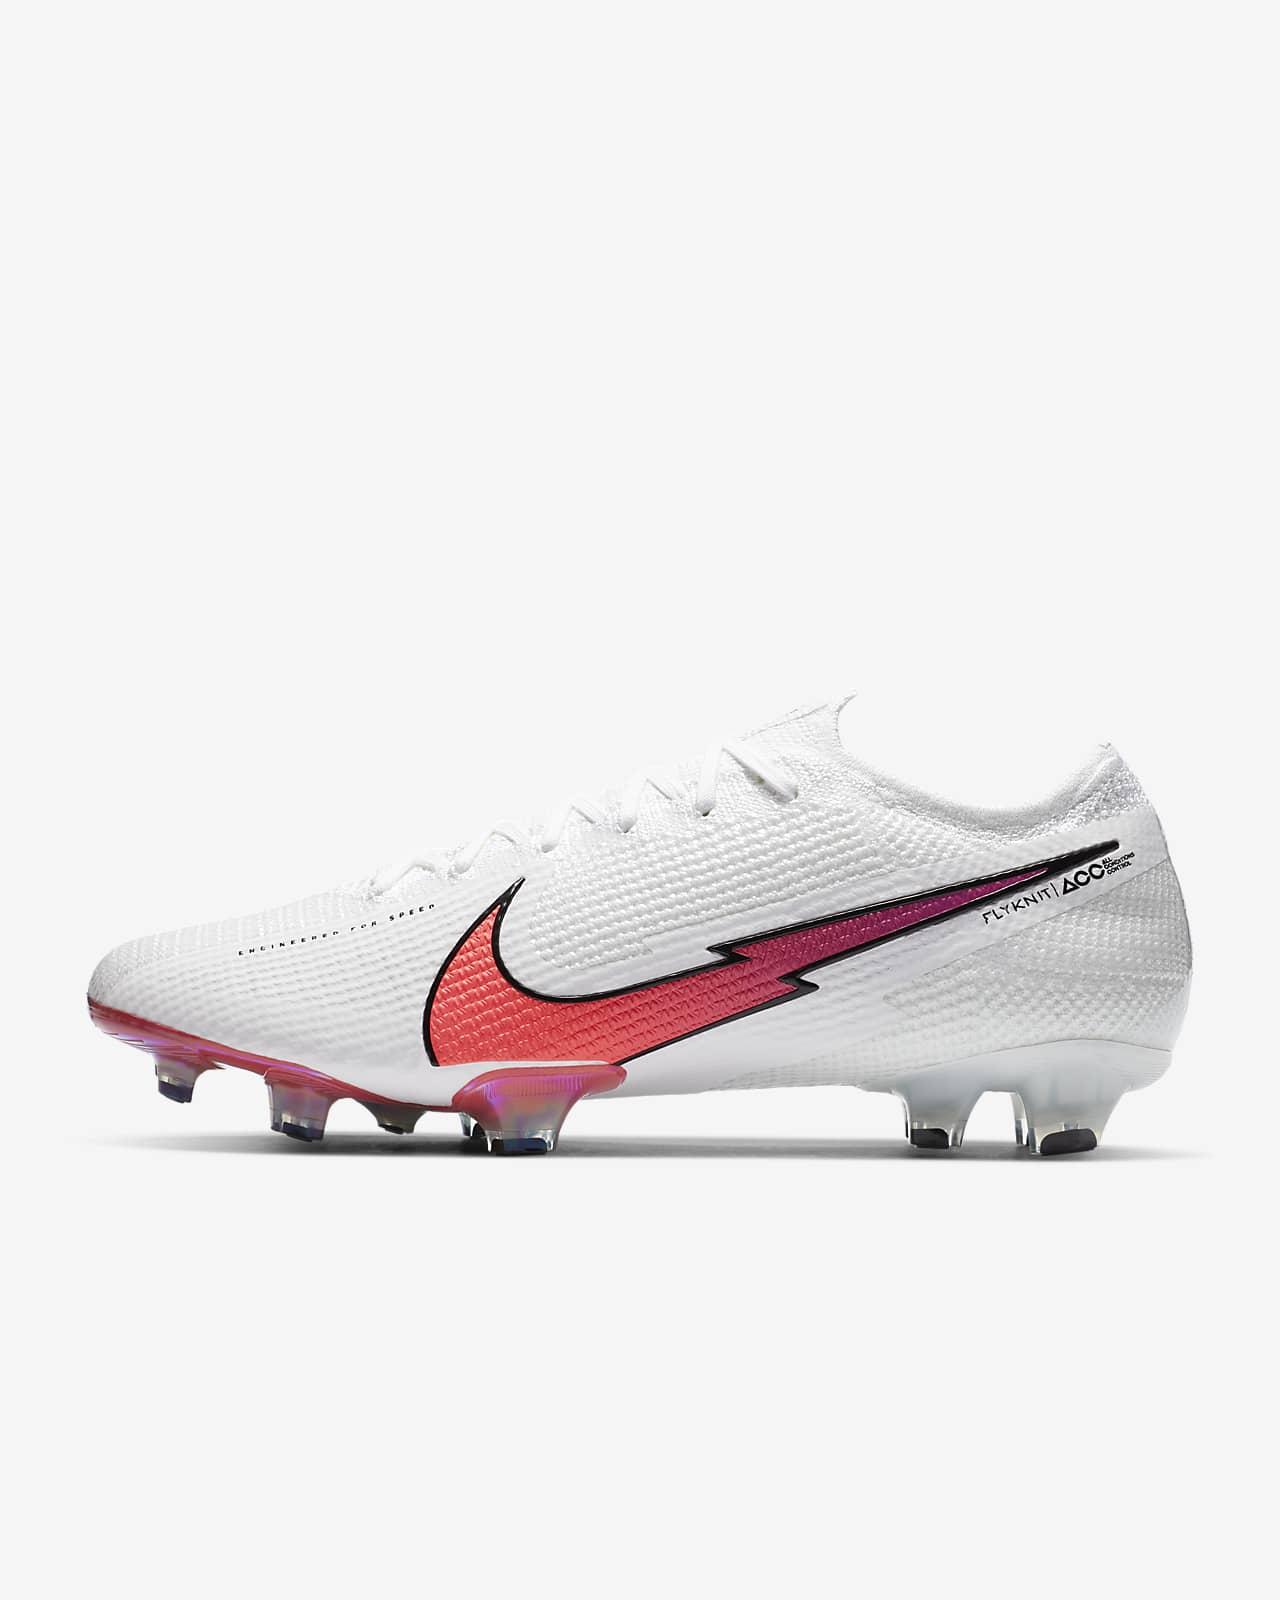 Chuteiras de futebol para terreno firme Nike Mercurial Vapor 13 Elite FG